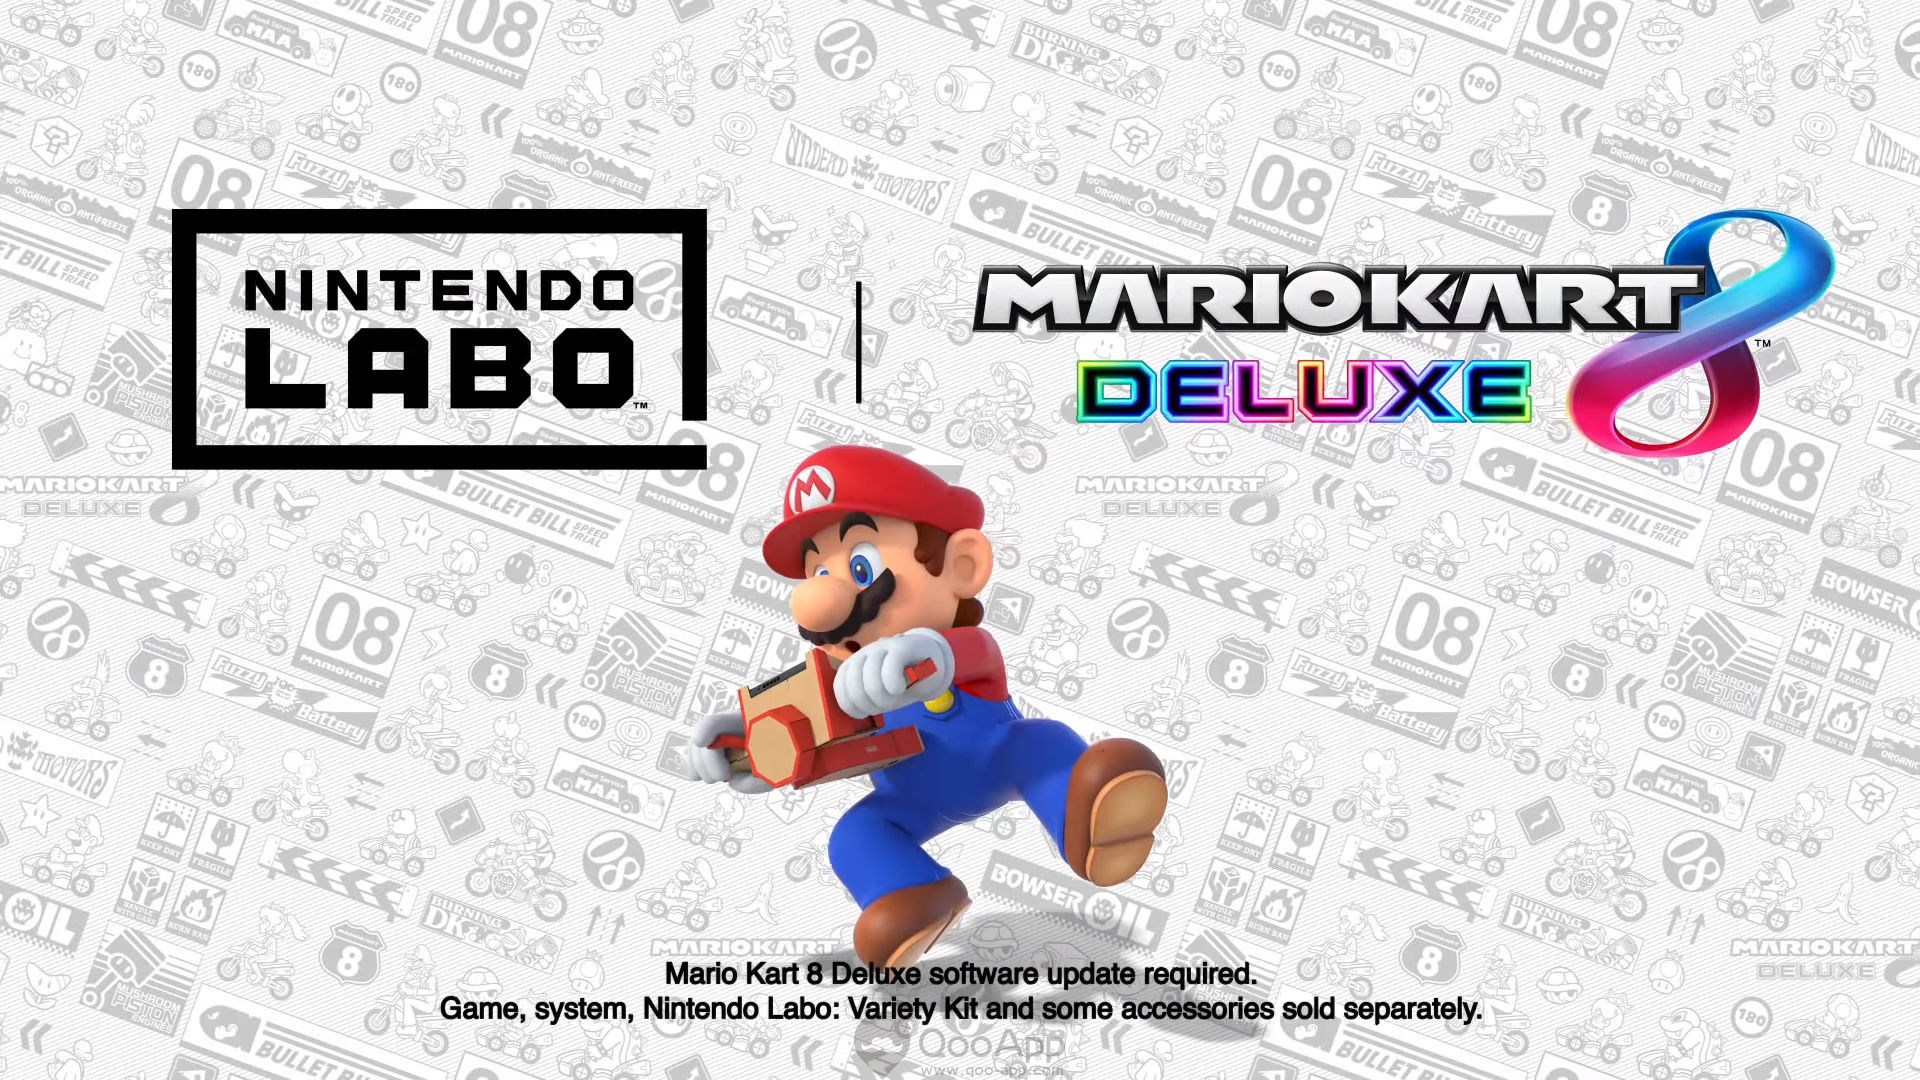 Nintendo Labo compatible avec Mario Kart 8 Deluxe